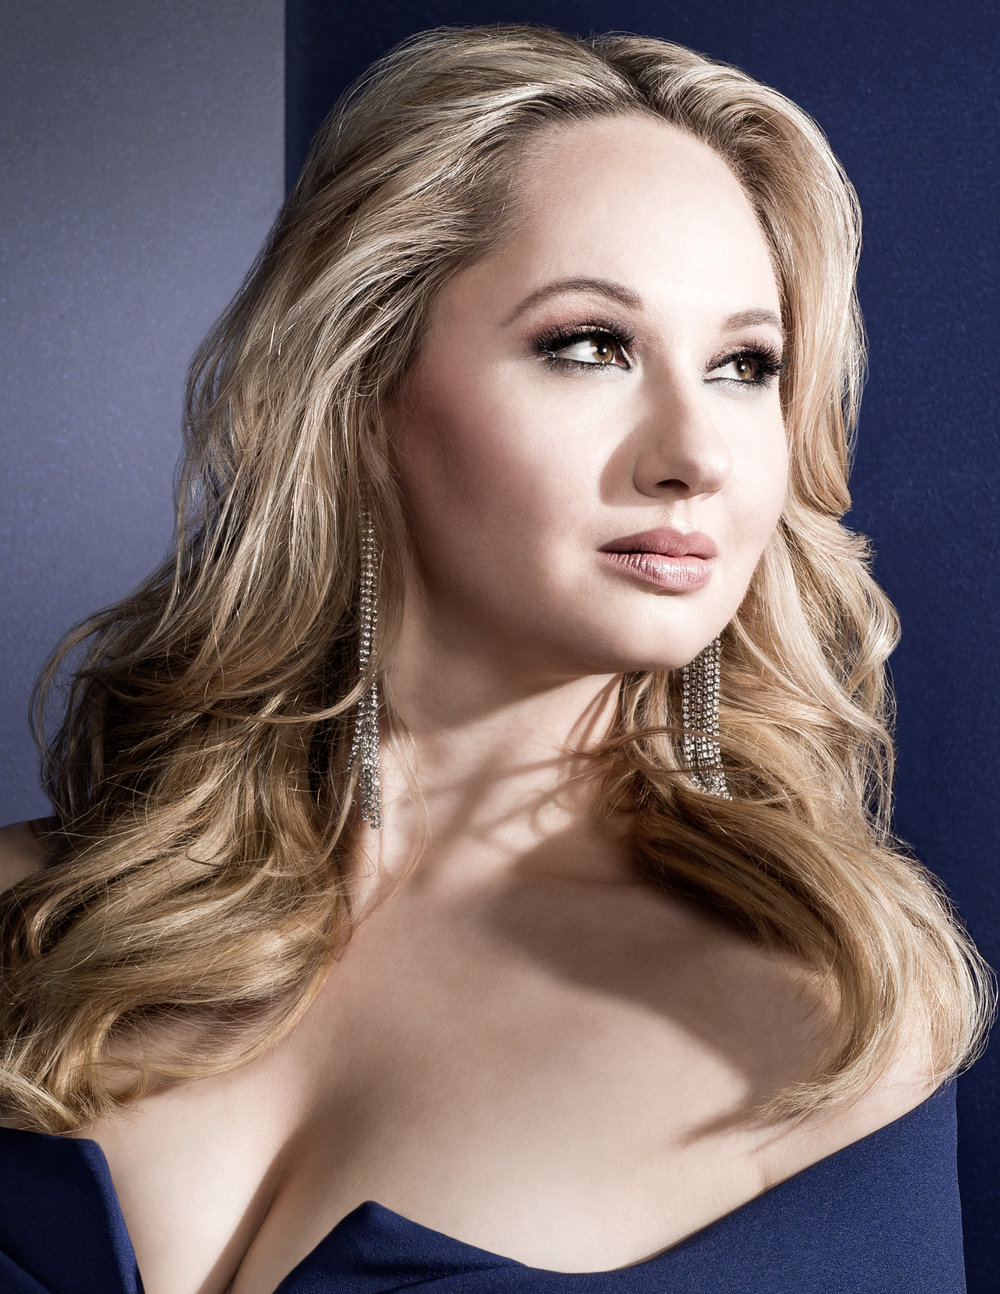 MEGAN MIKAIlOVNA SAMARIN,  mezzo-soprano